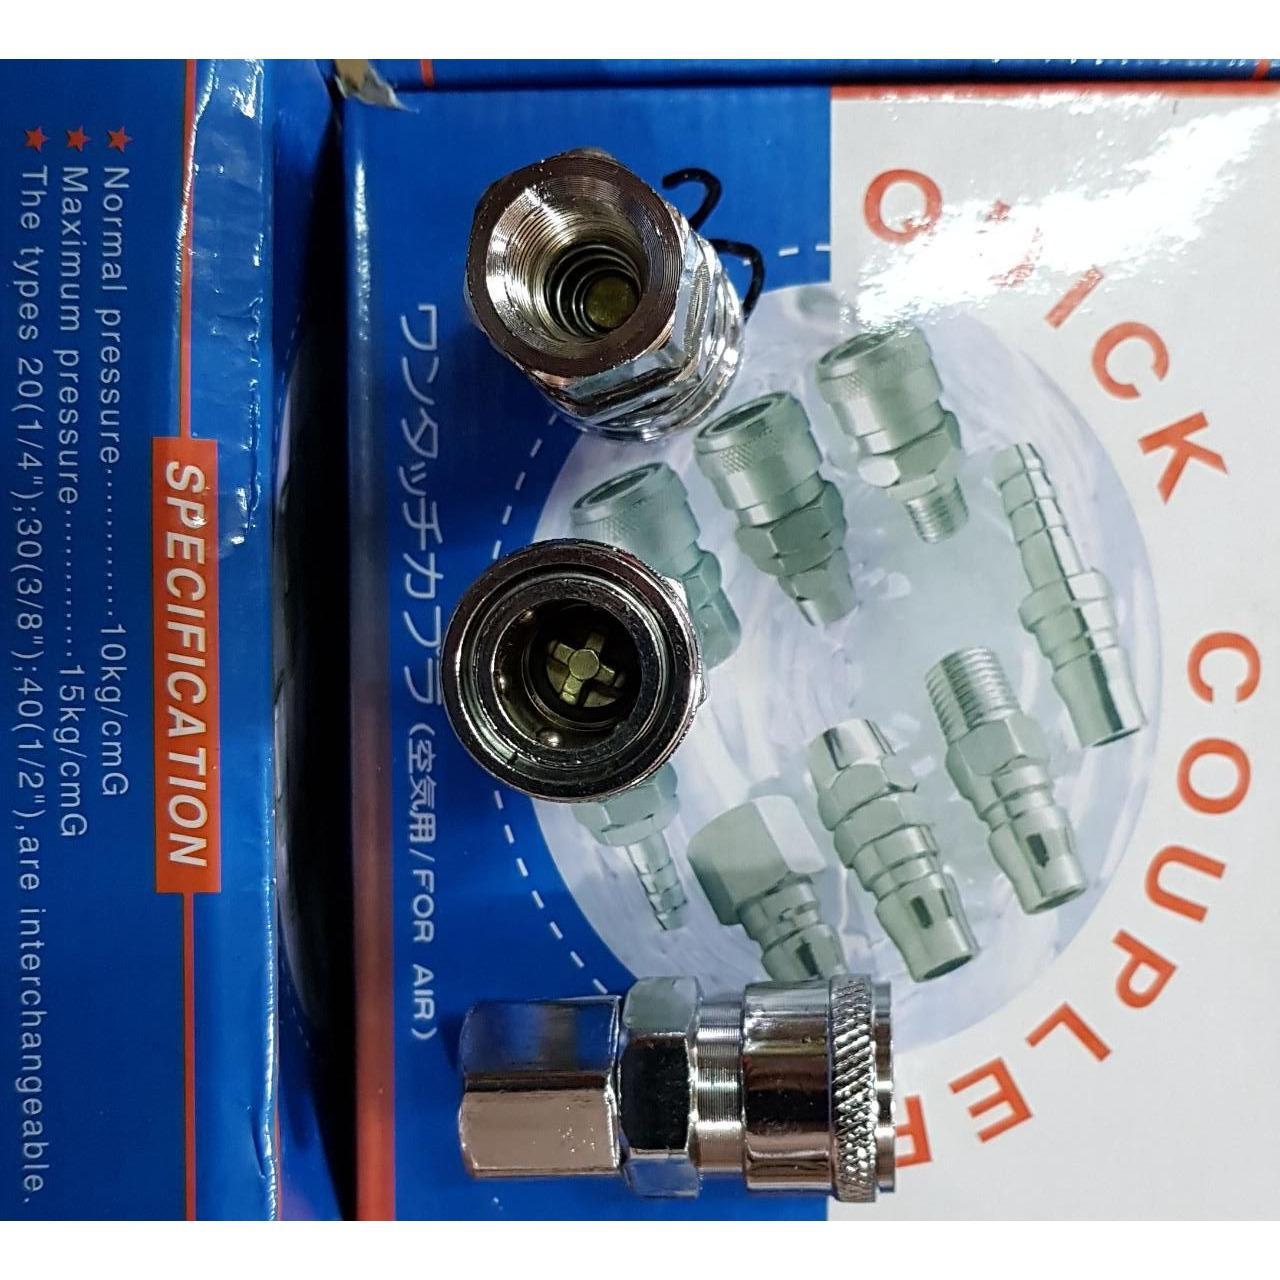 Cek Harga Baru Tekiro Quick Coupler Two Touch 20 Sh Fitting 20ph Air Sf Sambung Selang Kompresor Recoil Cuk Kopler